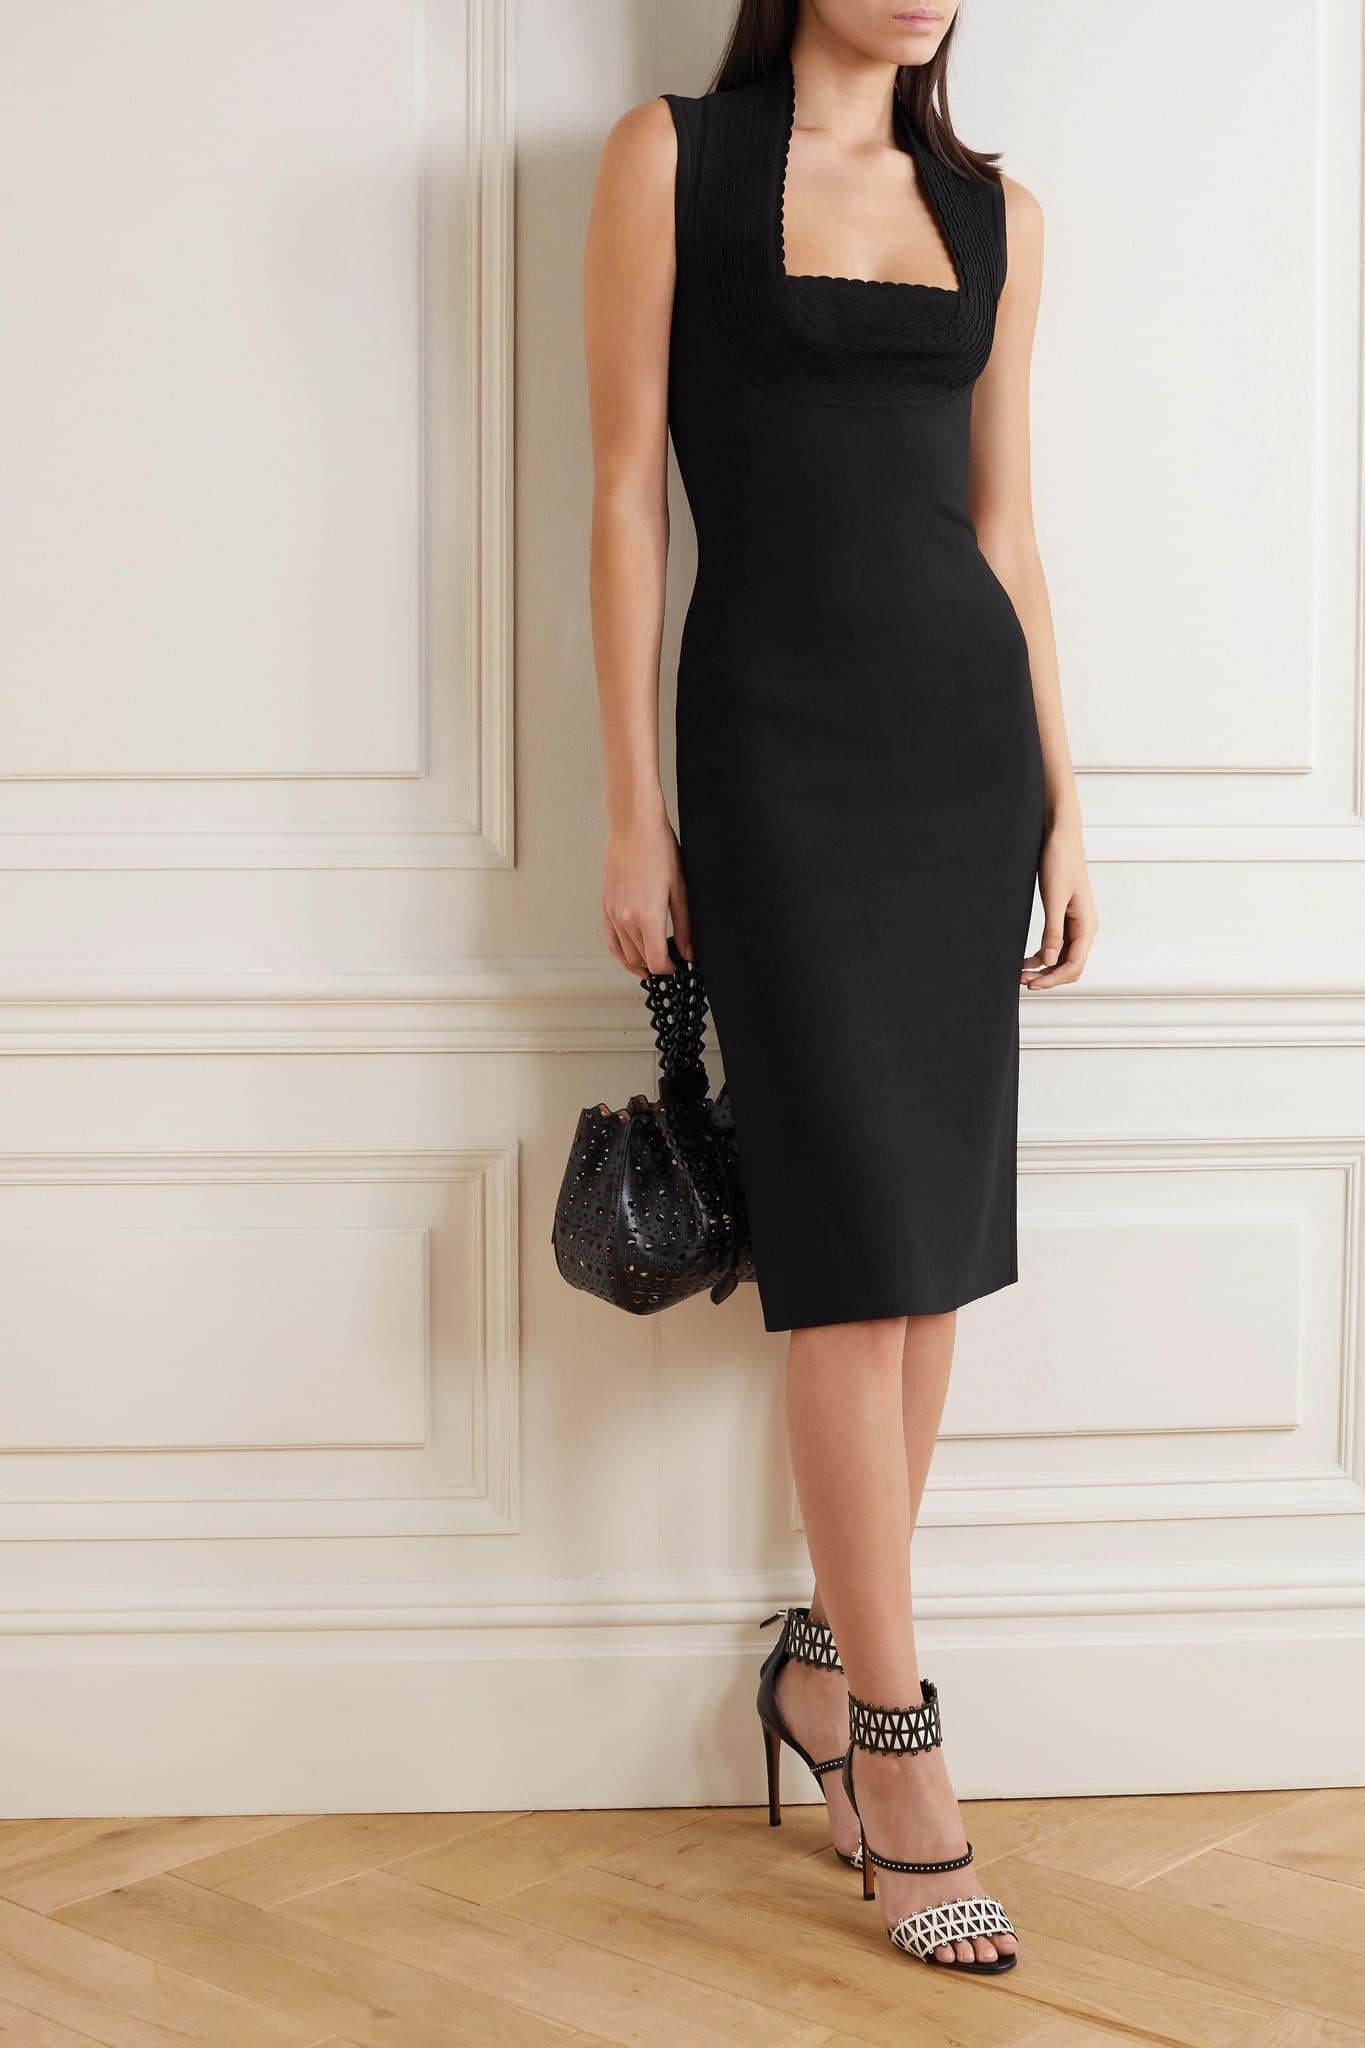 ALAÏA Scalloped Stretch-knit Midi Dress